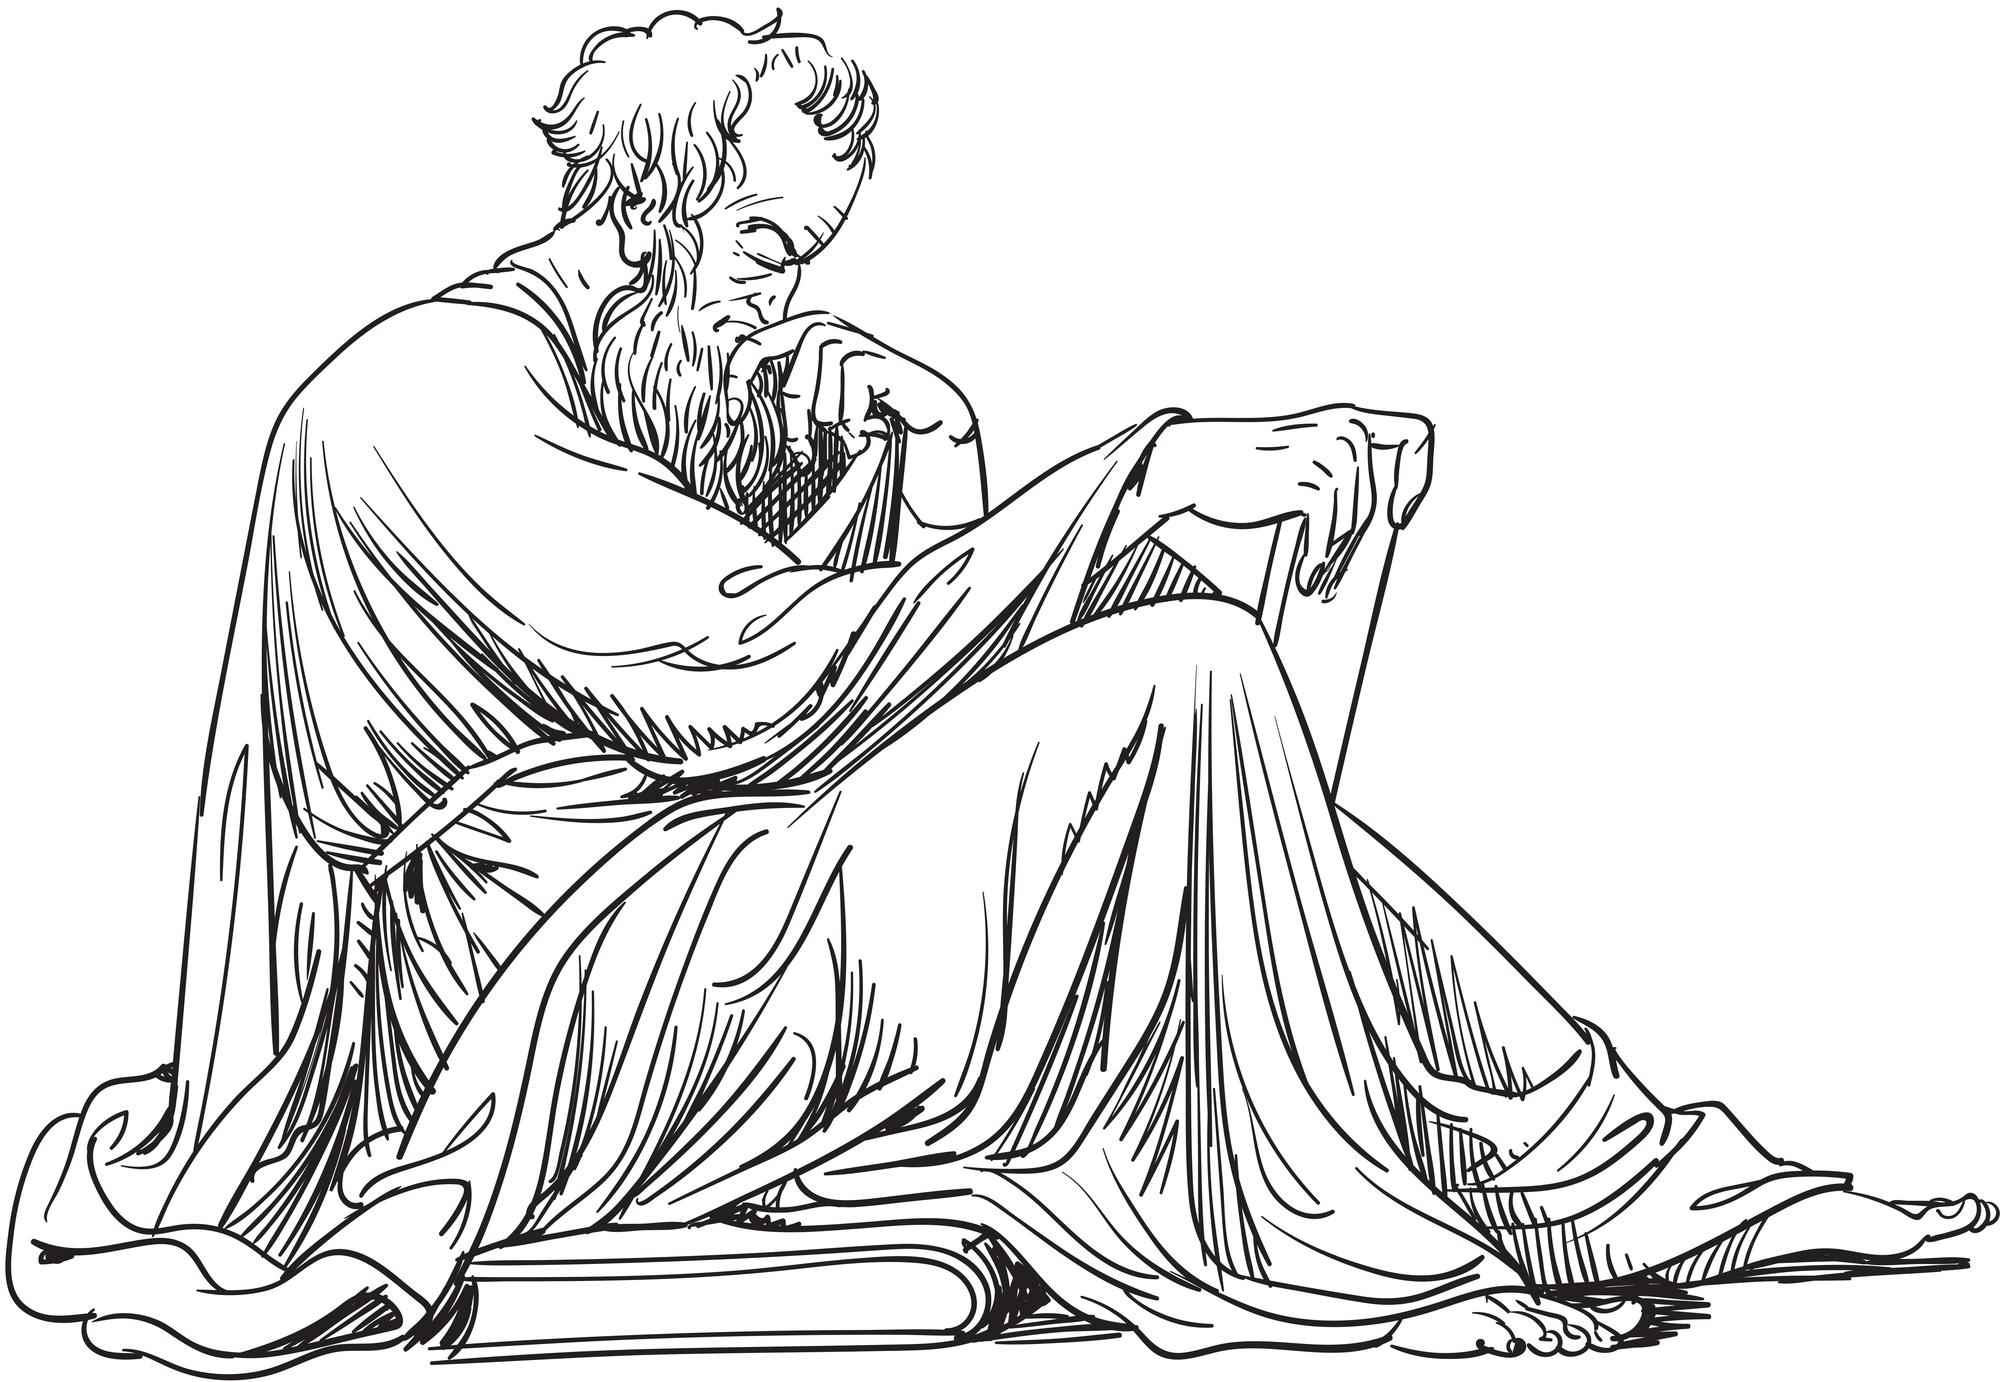 A sketch image of Greek philosopher Epictetus